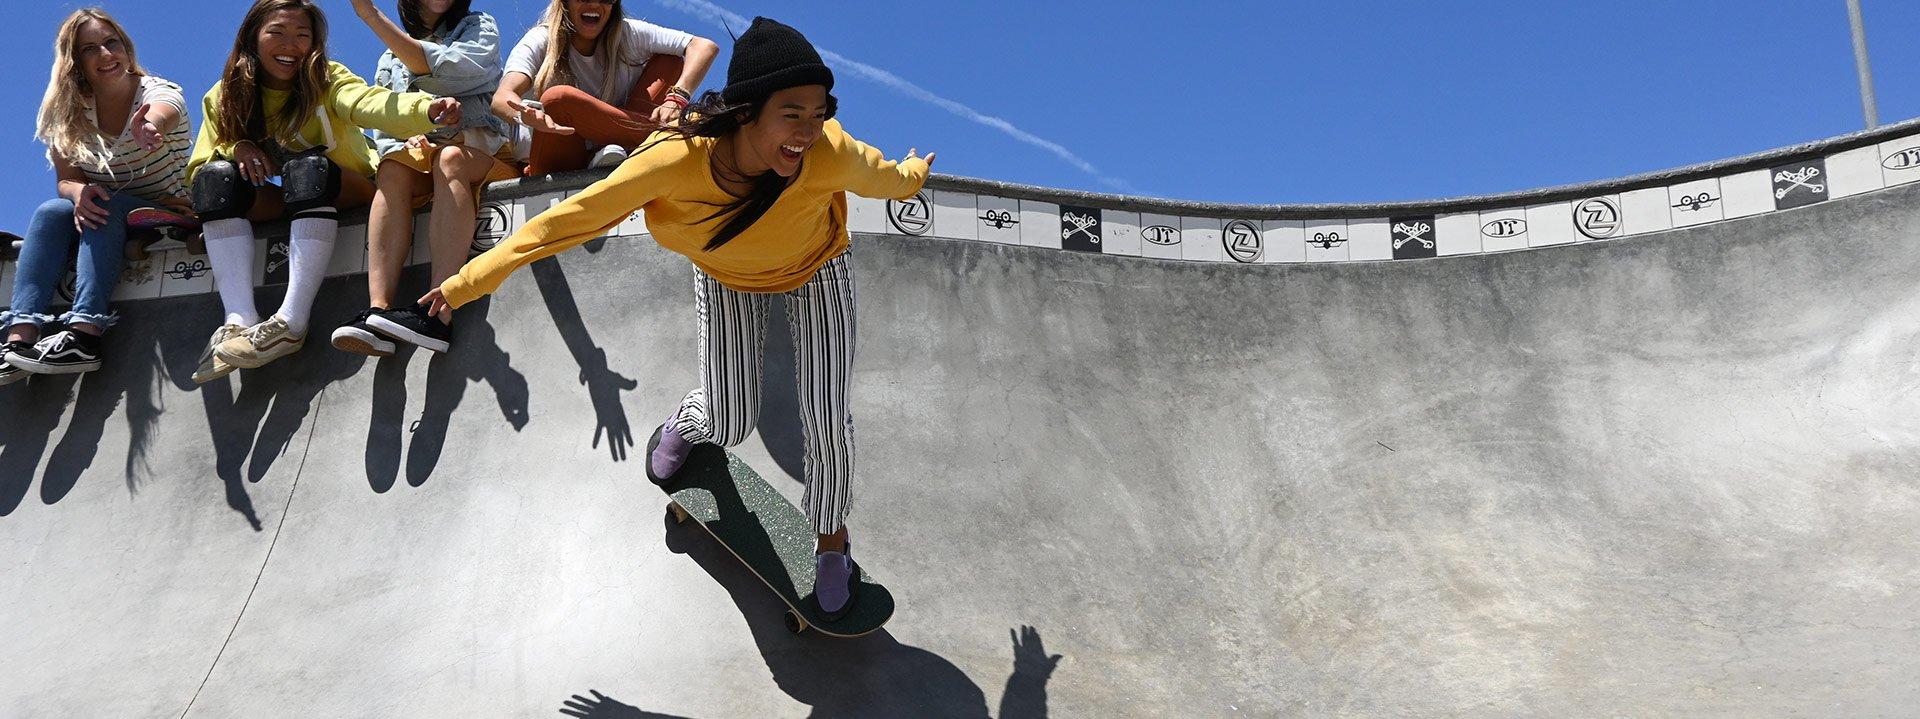 dievča na skateboarde